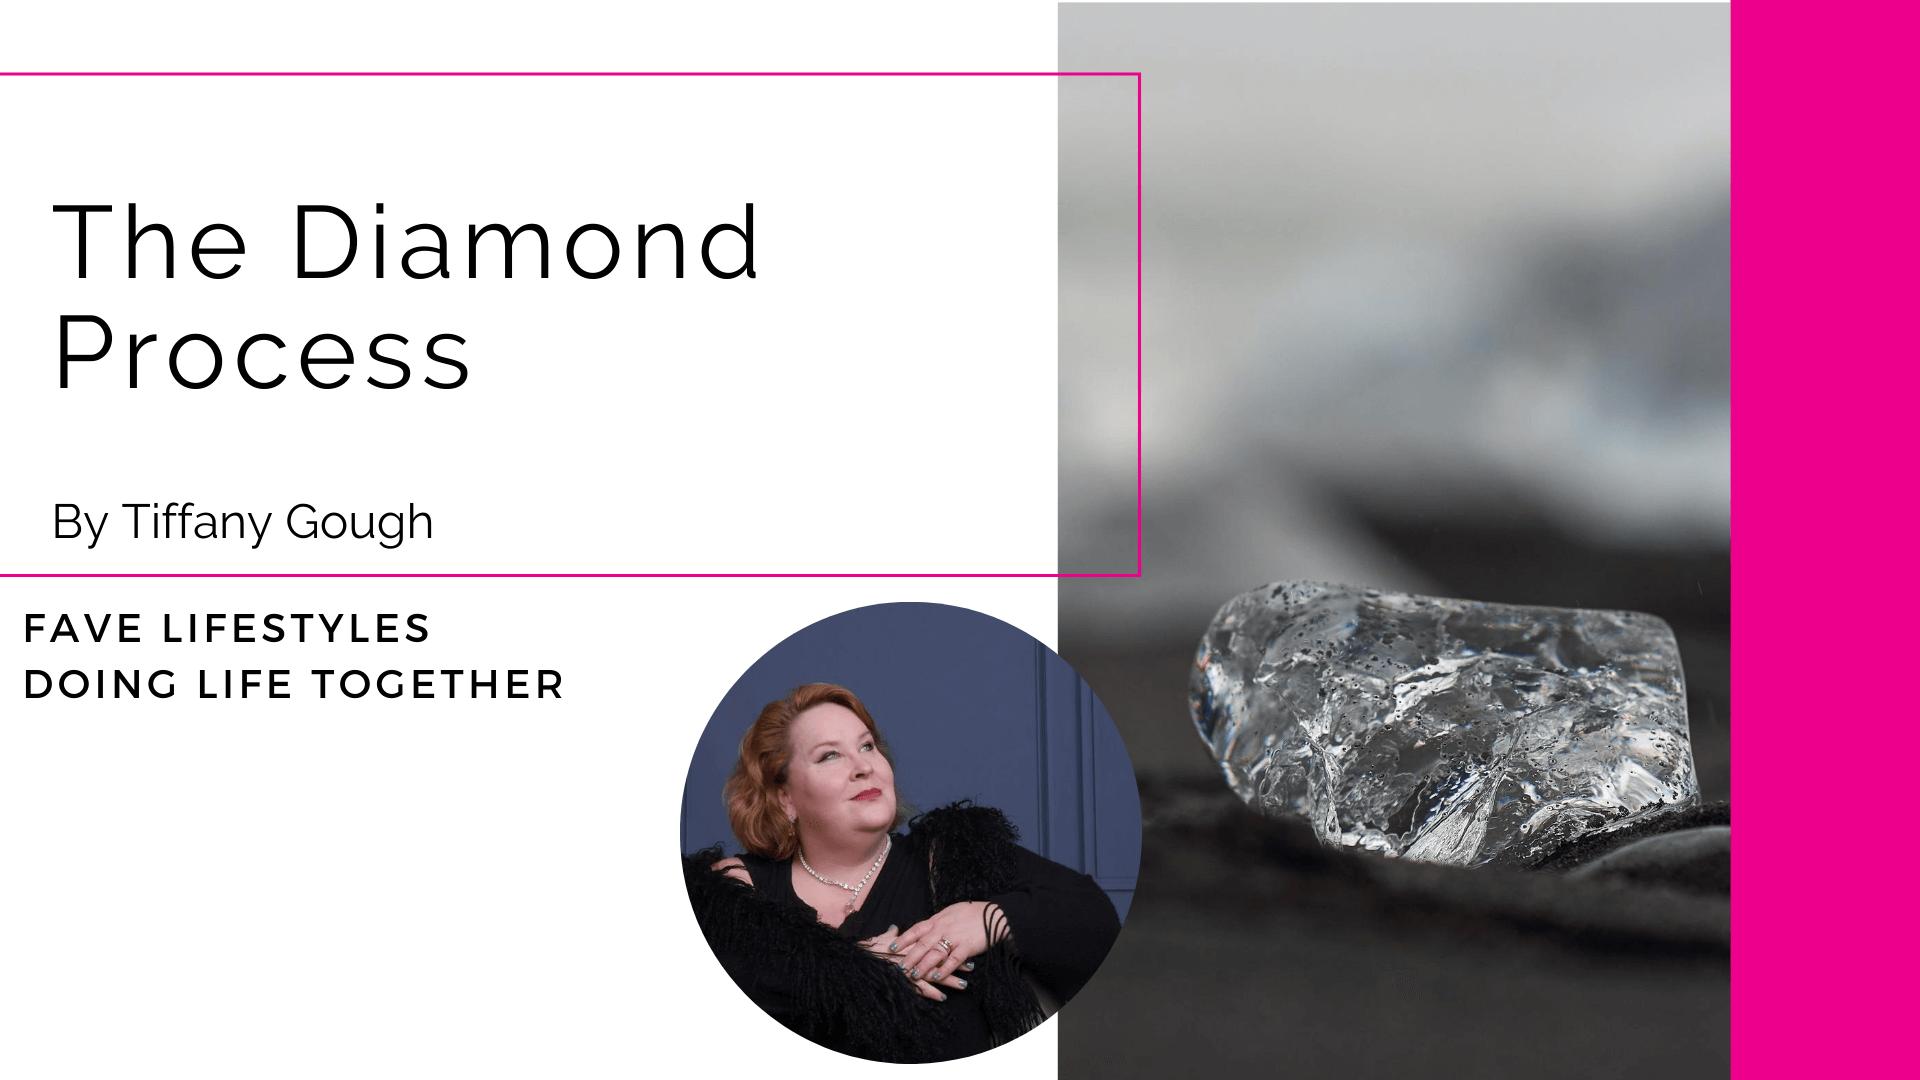 The Diamond Process